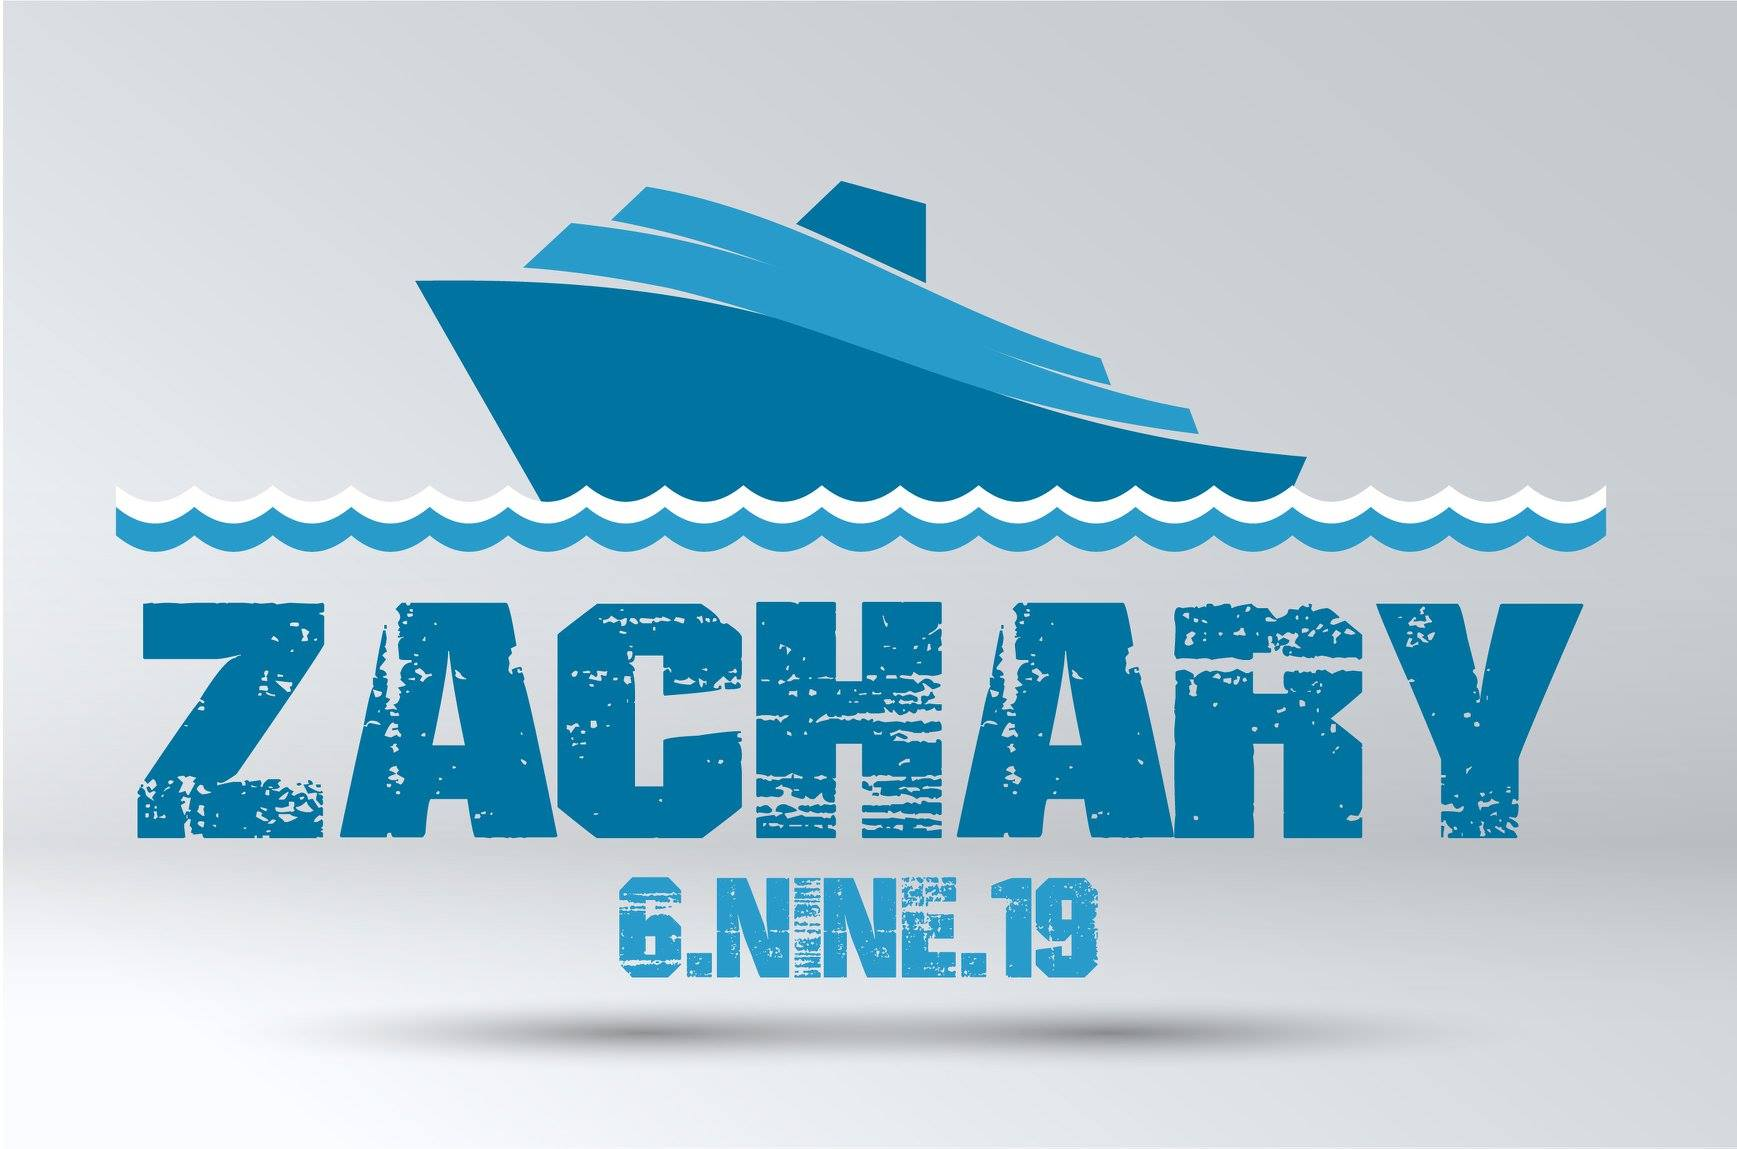 nj-mitzvah-dj-logo-design.jpg